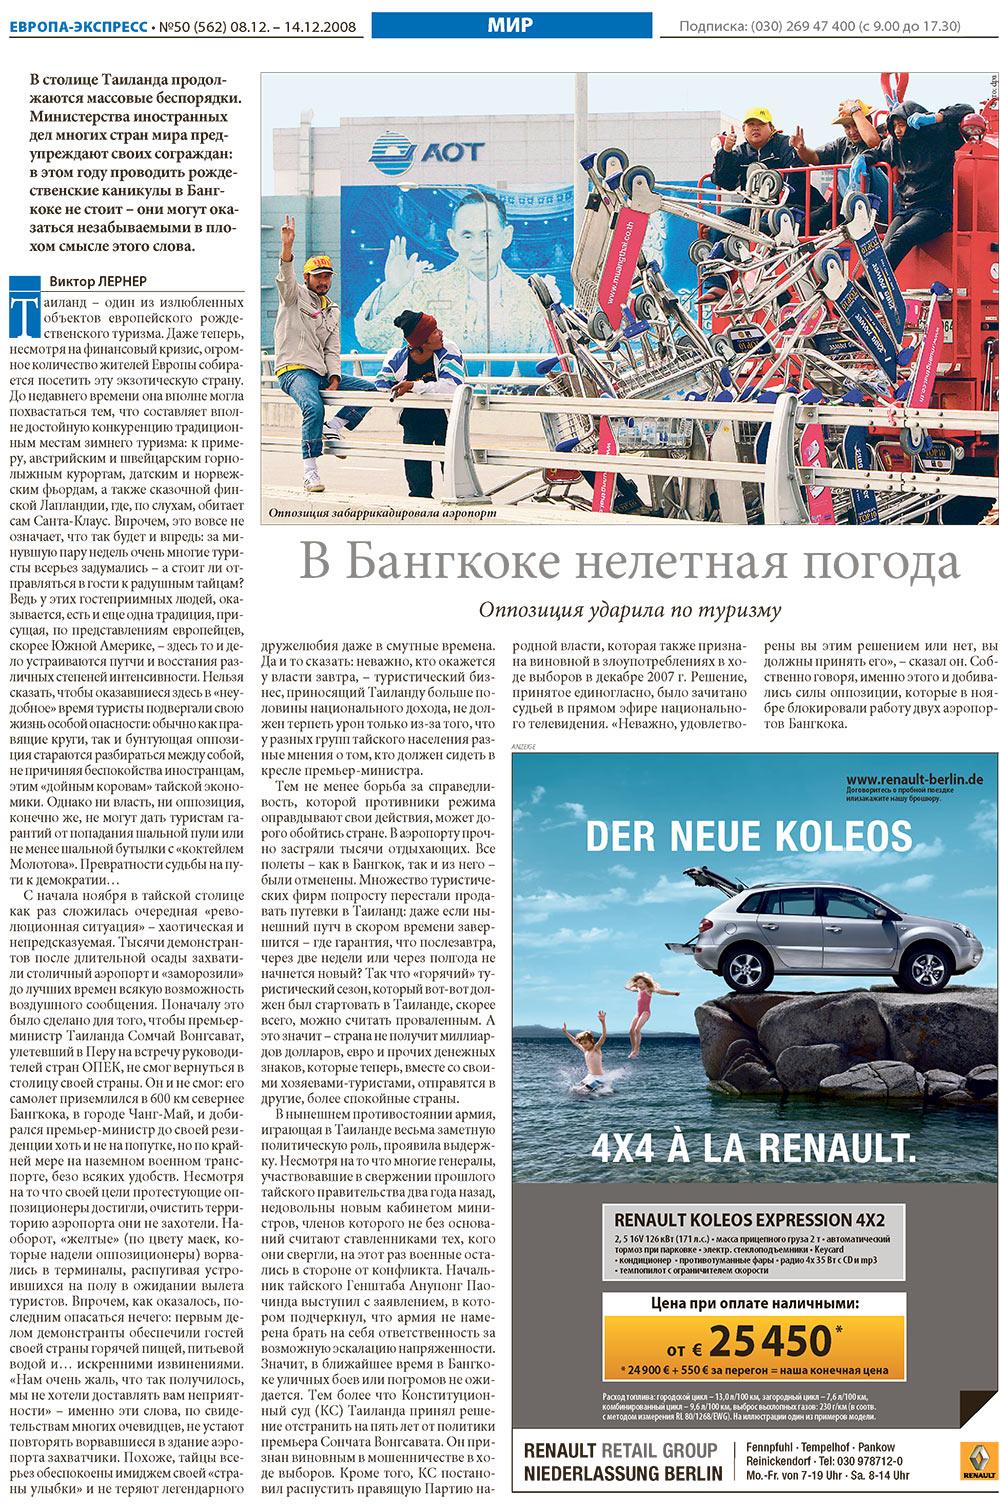 Европа экспресс (газета). 2008 год, номер 50, стр. 11